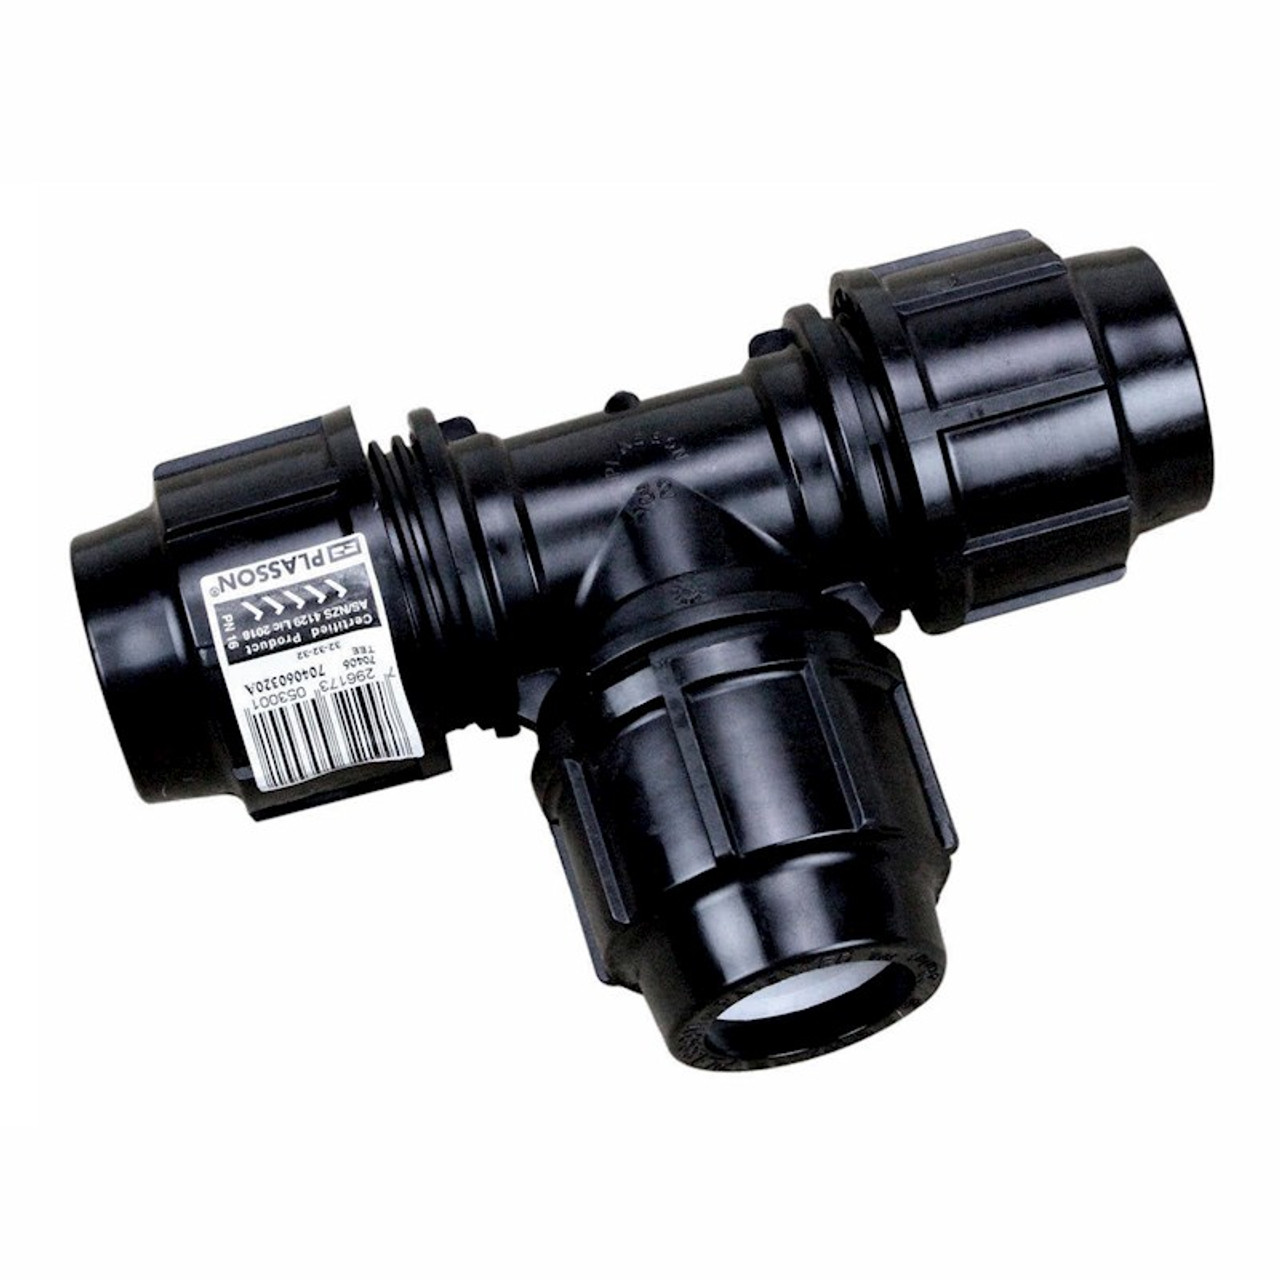 32mm Metric Poly Tee - Plasson Metric Poly Pipe